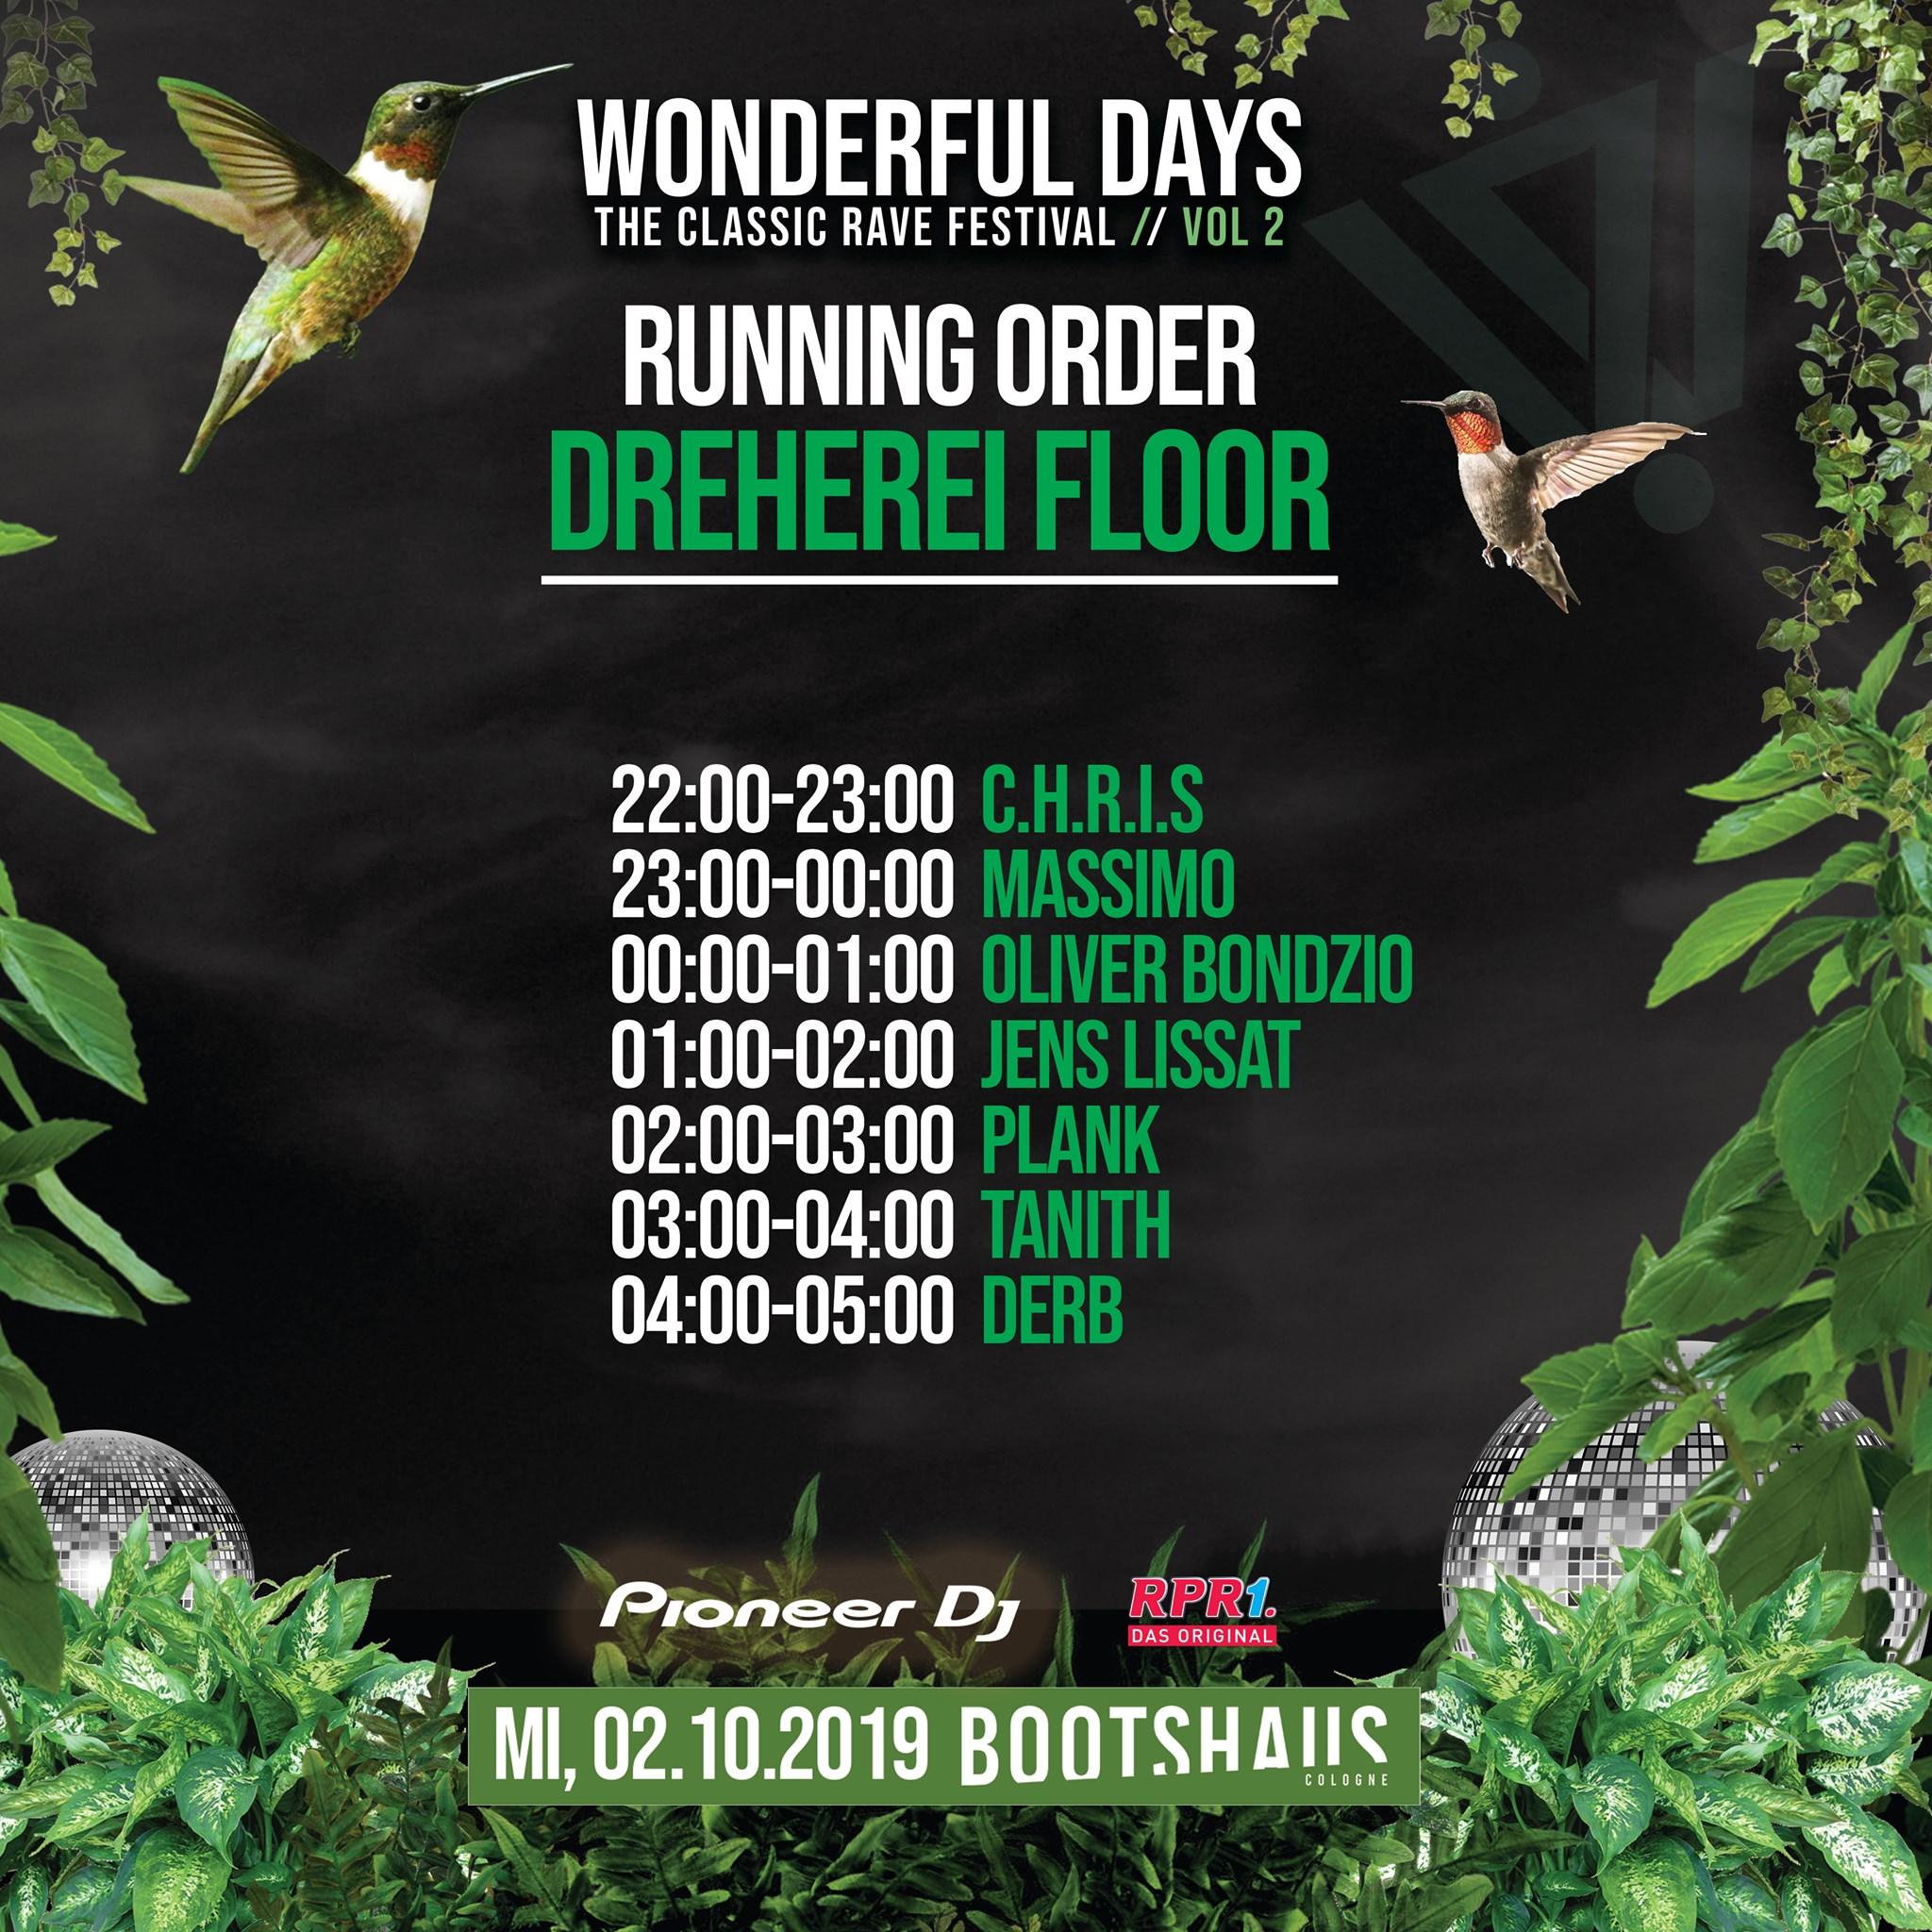 Wonderful Days – The classic Rave am 2.10.2019, Lineup des Dreherei Floor